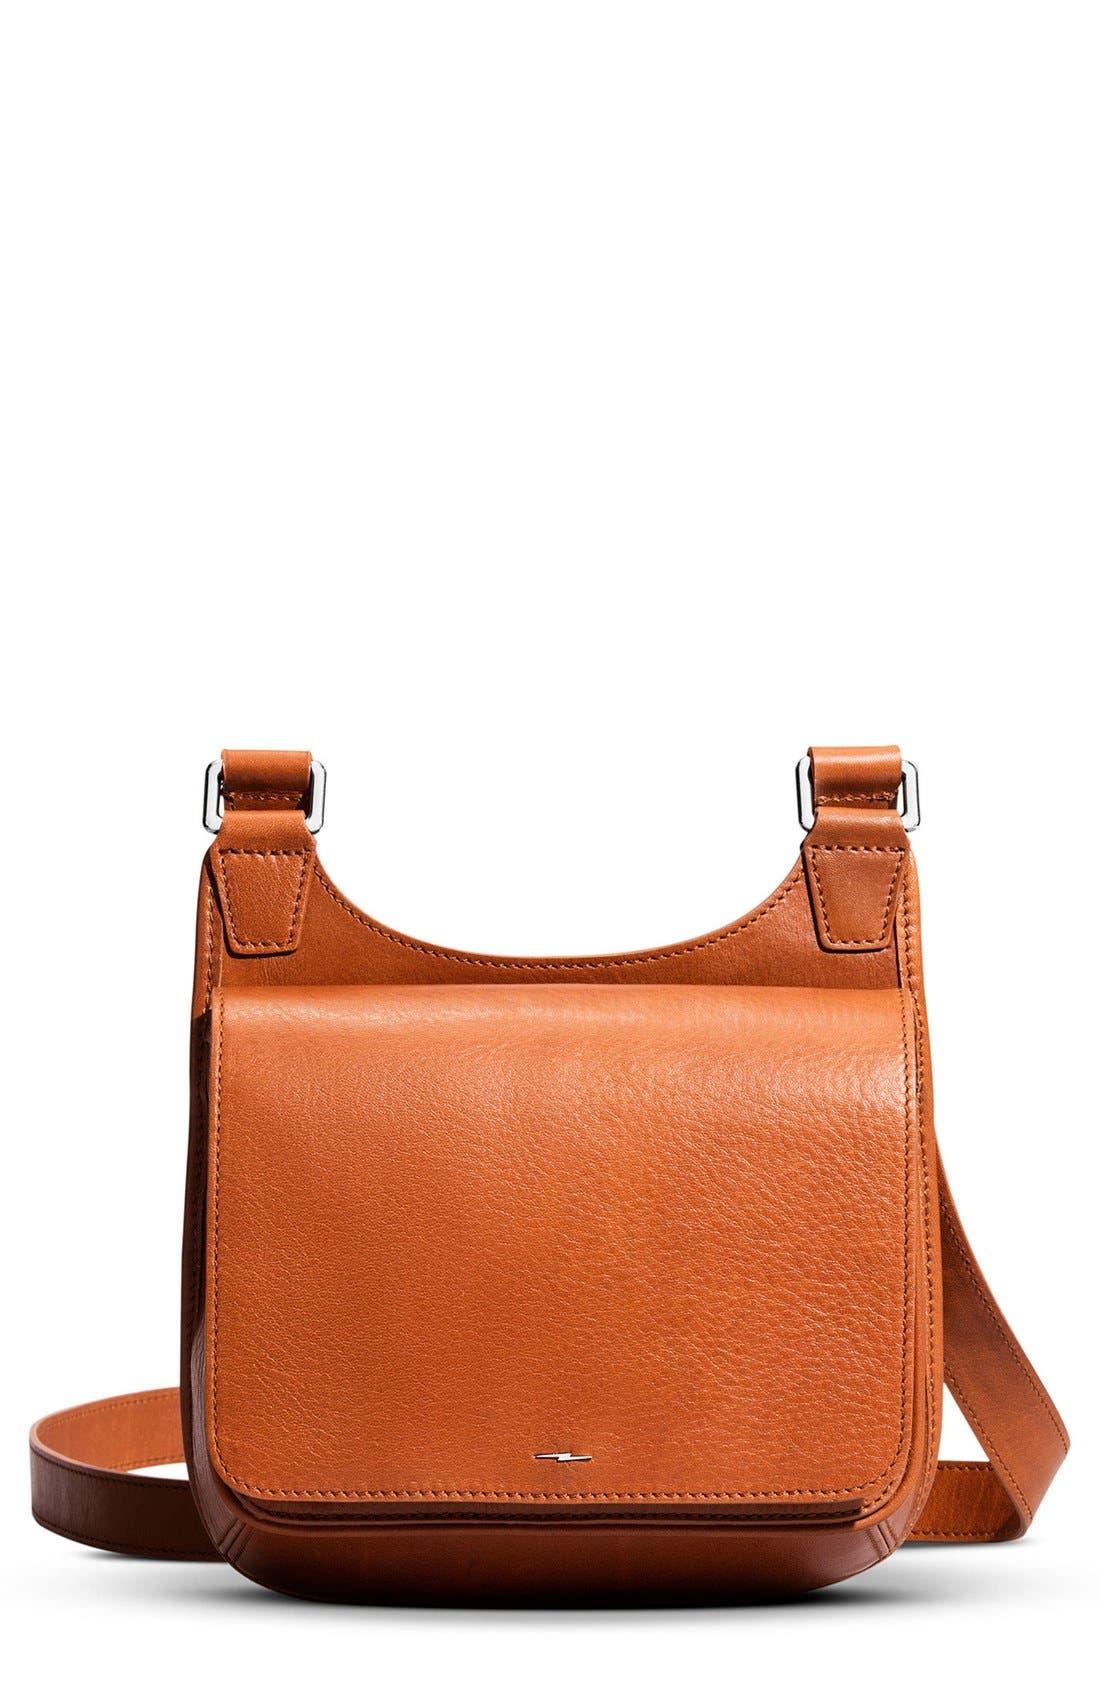 Shinola Small Field Leather Crossbody Bag